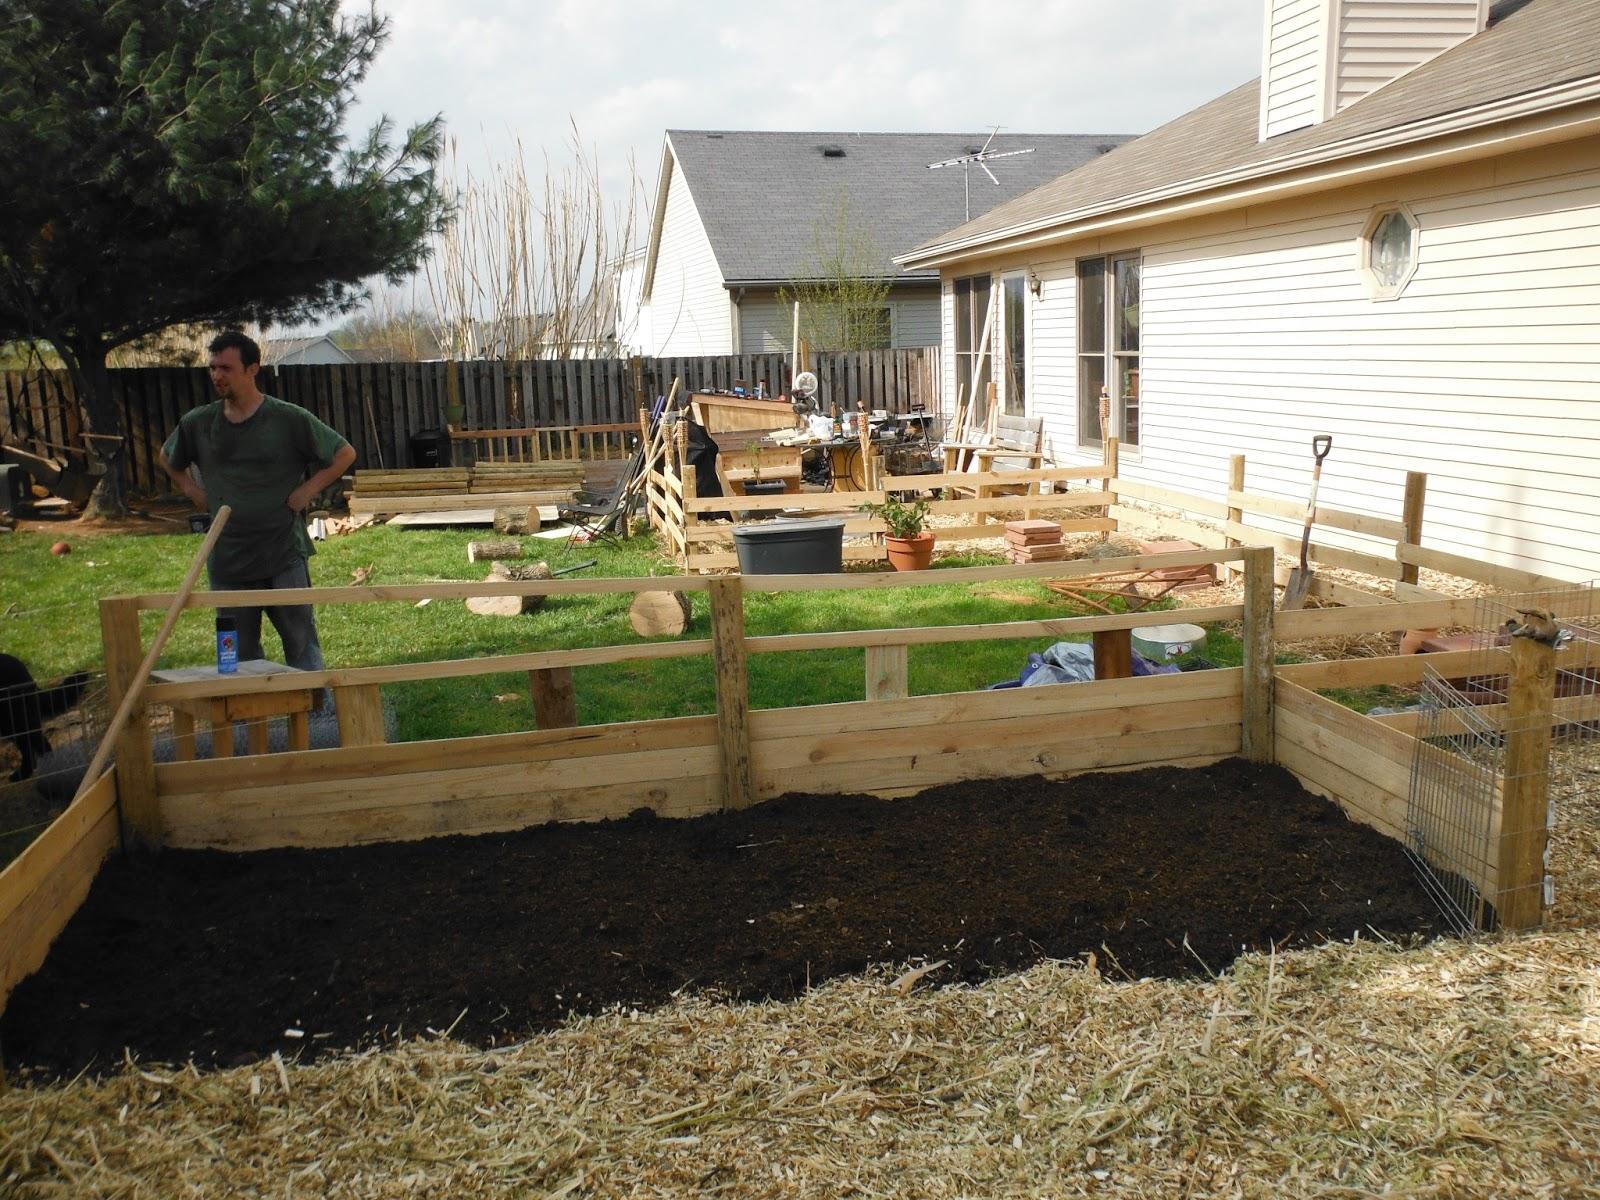 Suburban Backyard Farm: April 2013